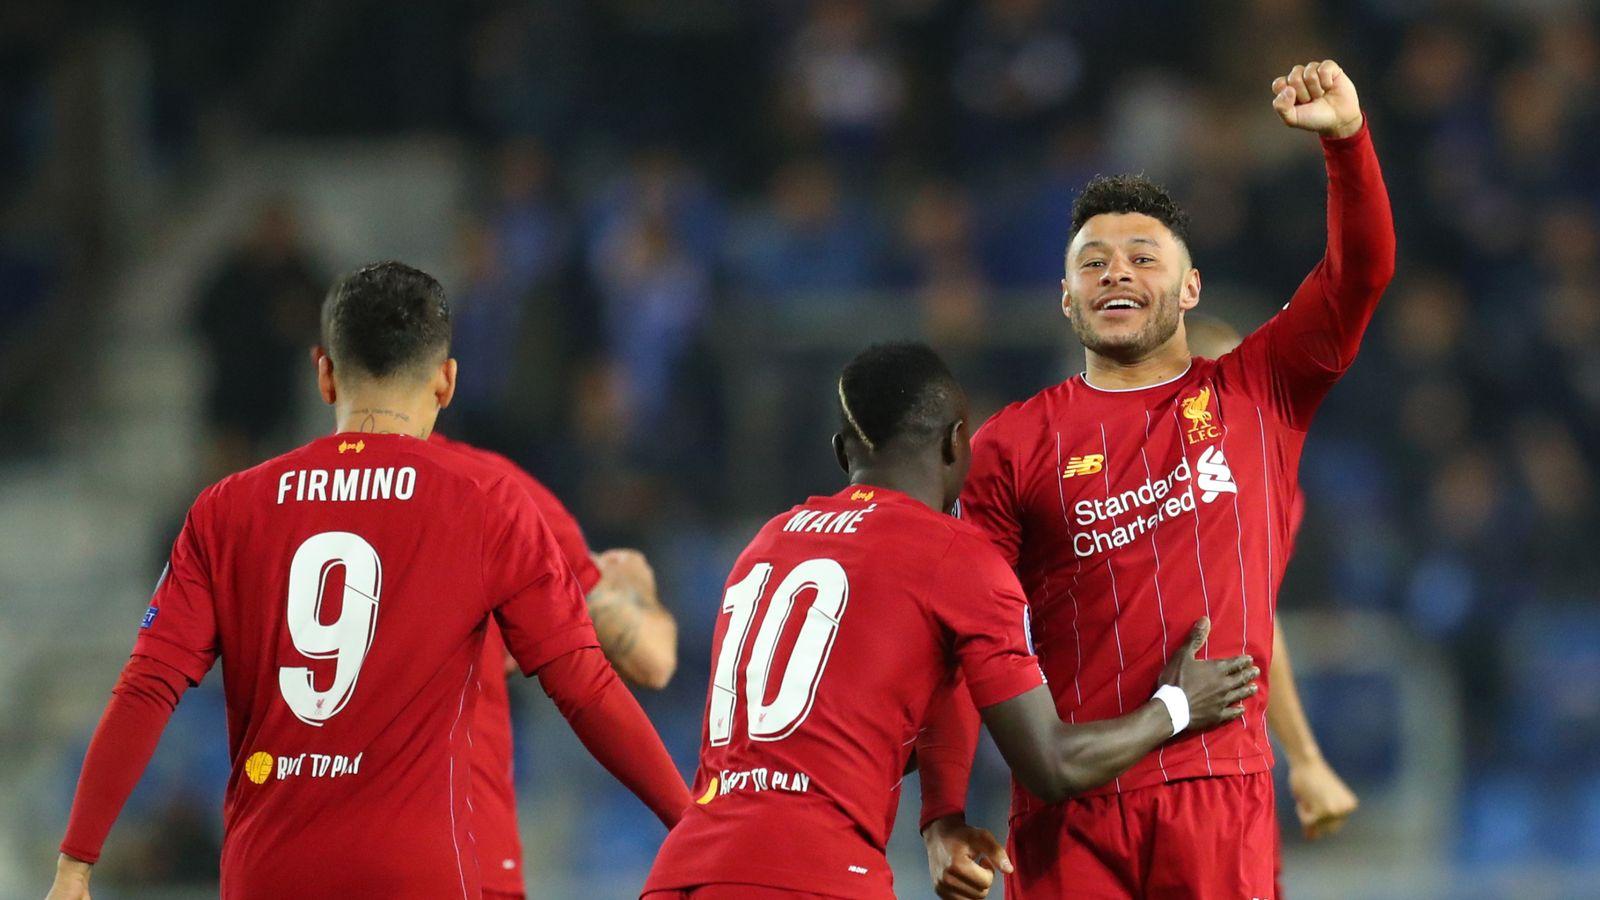 Genk 1-4 Liverpool: Alex Oxlade-Chamberlain double wins it on Champions League return